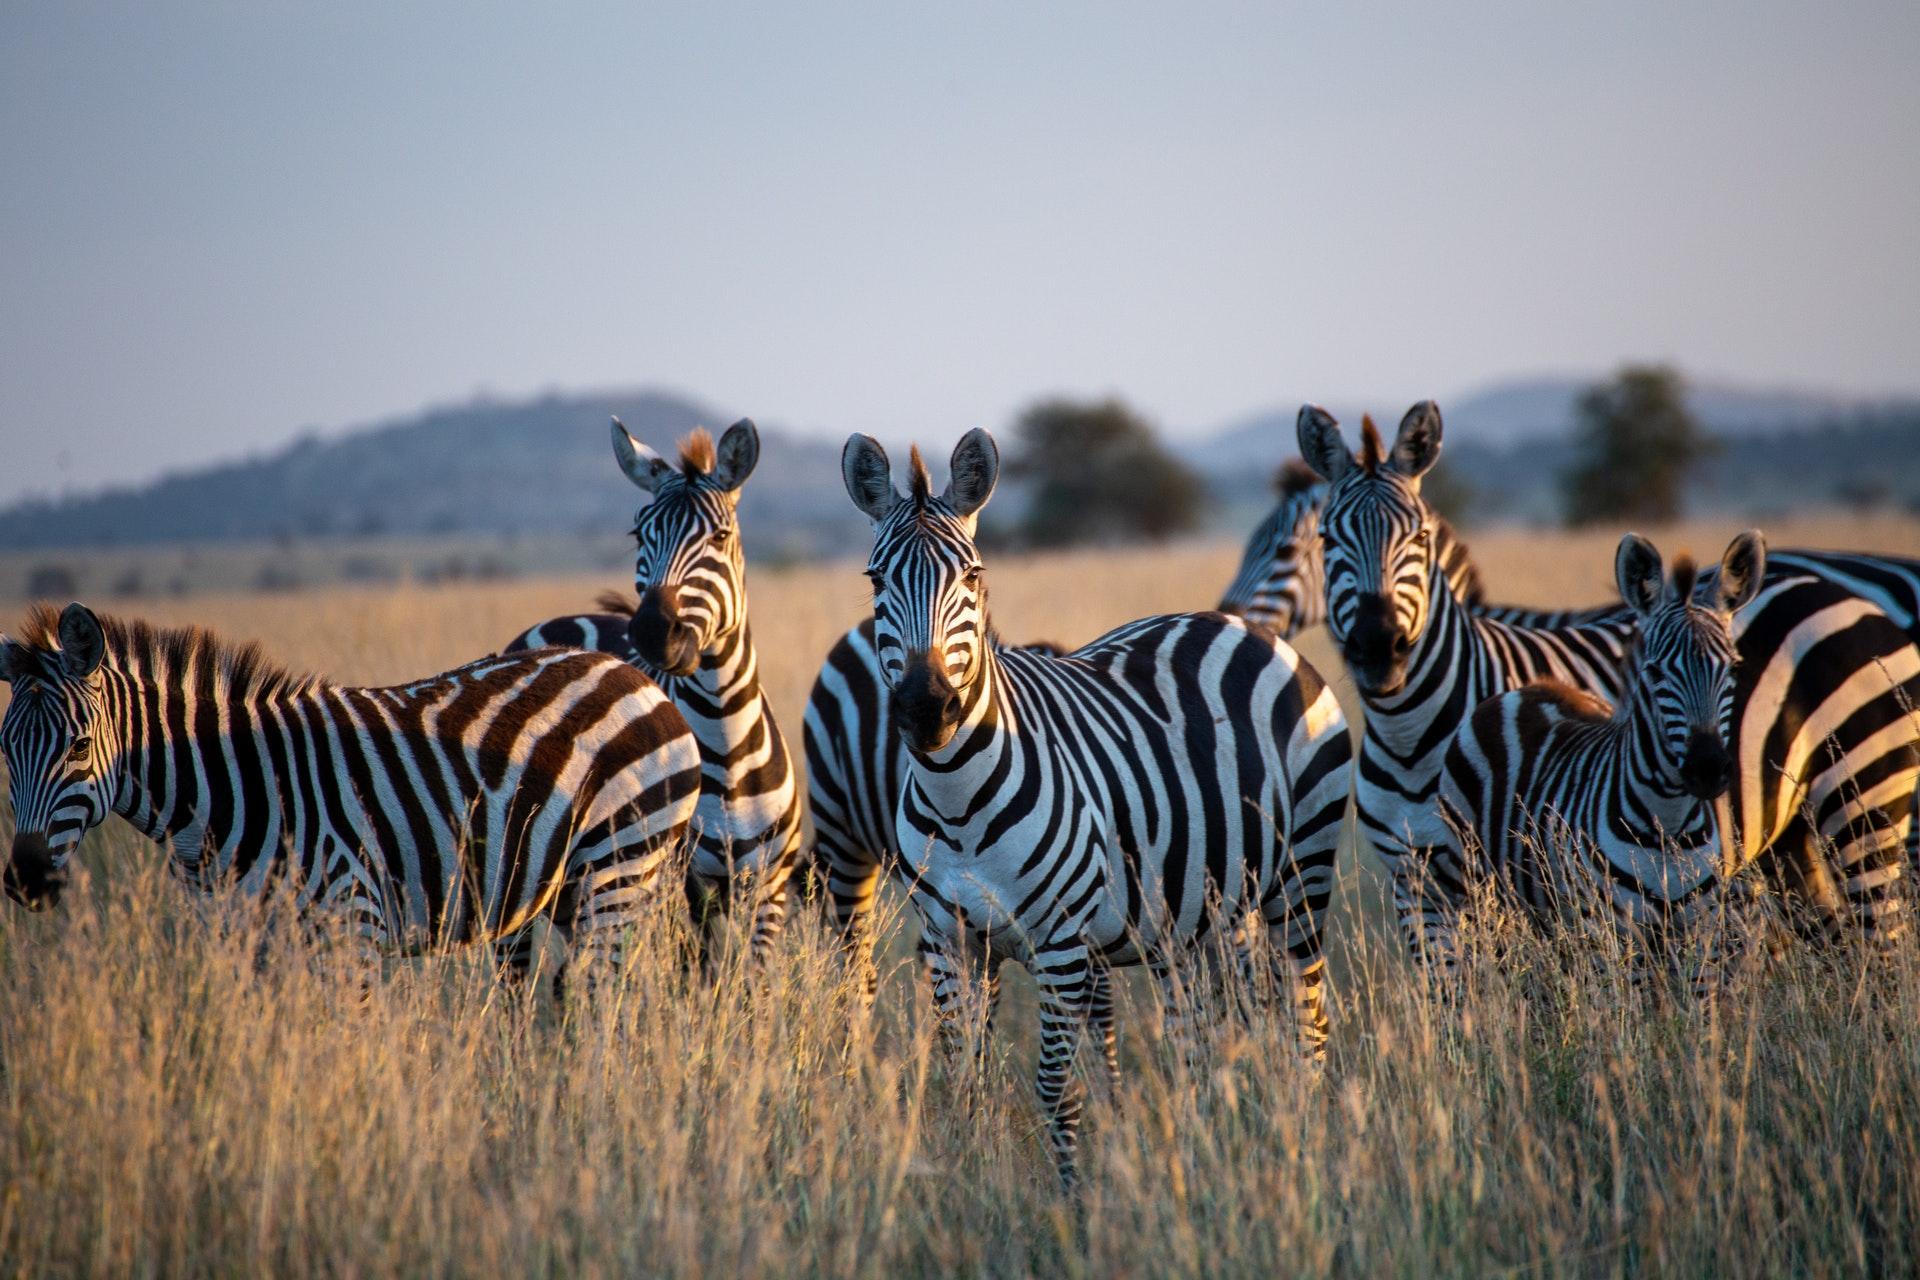 Destination image of Safari